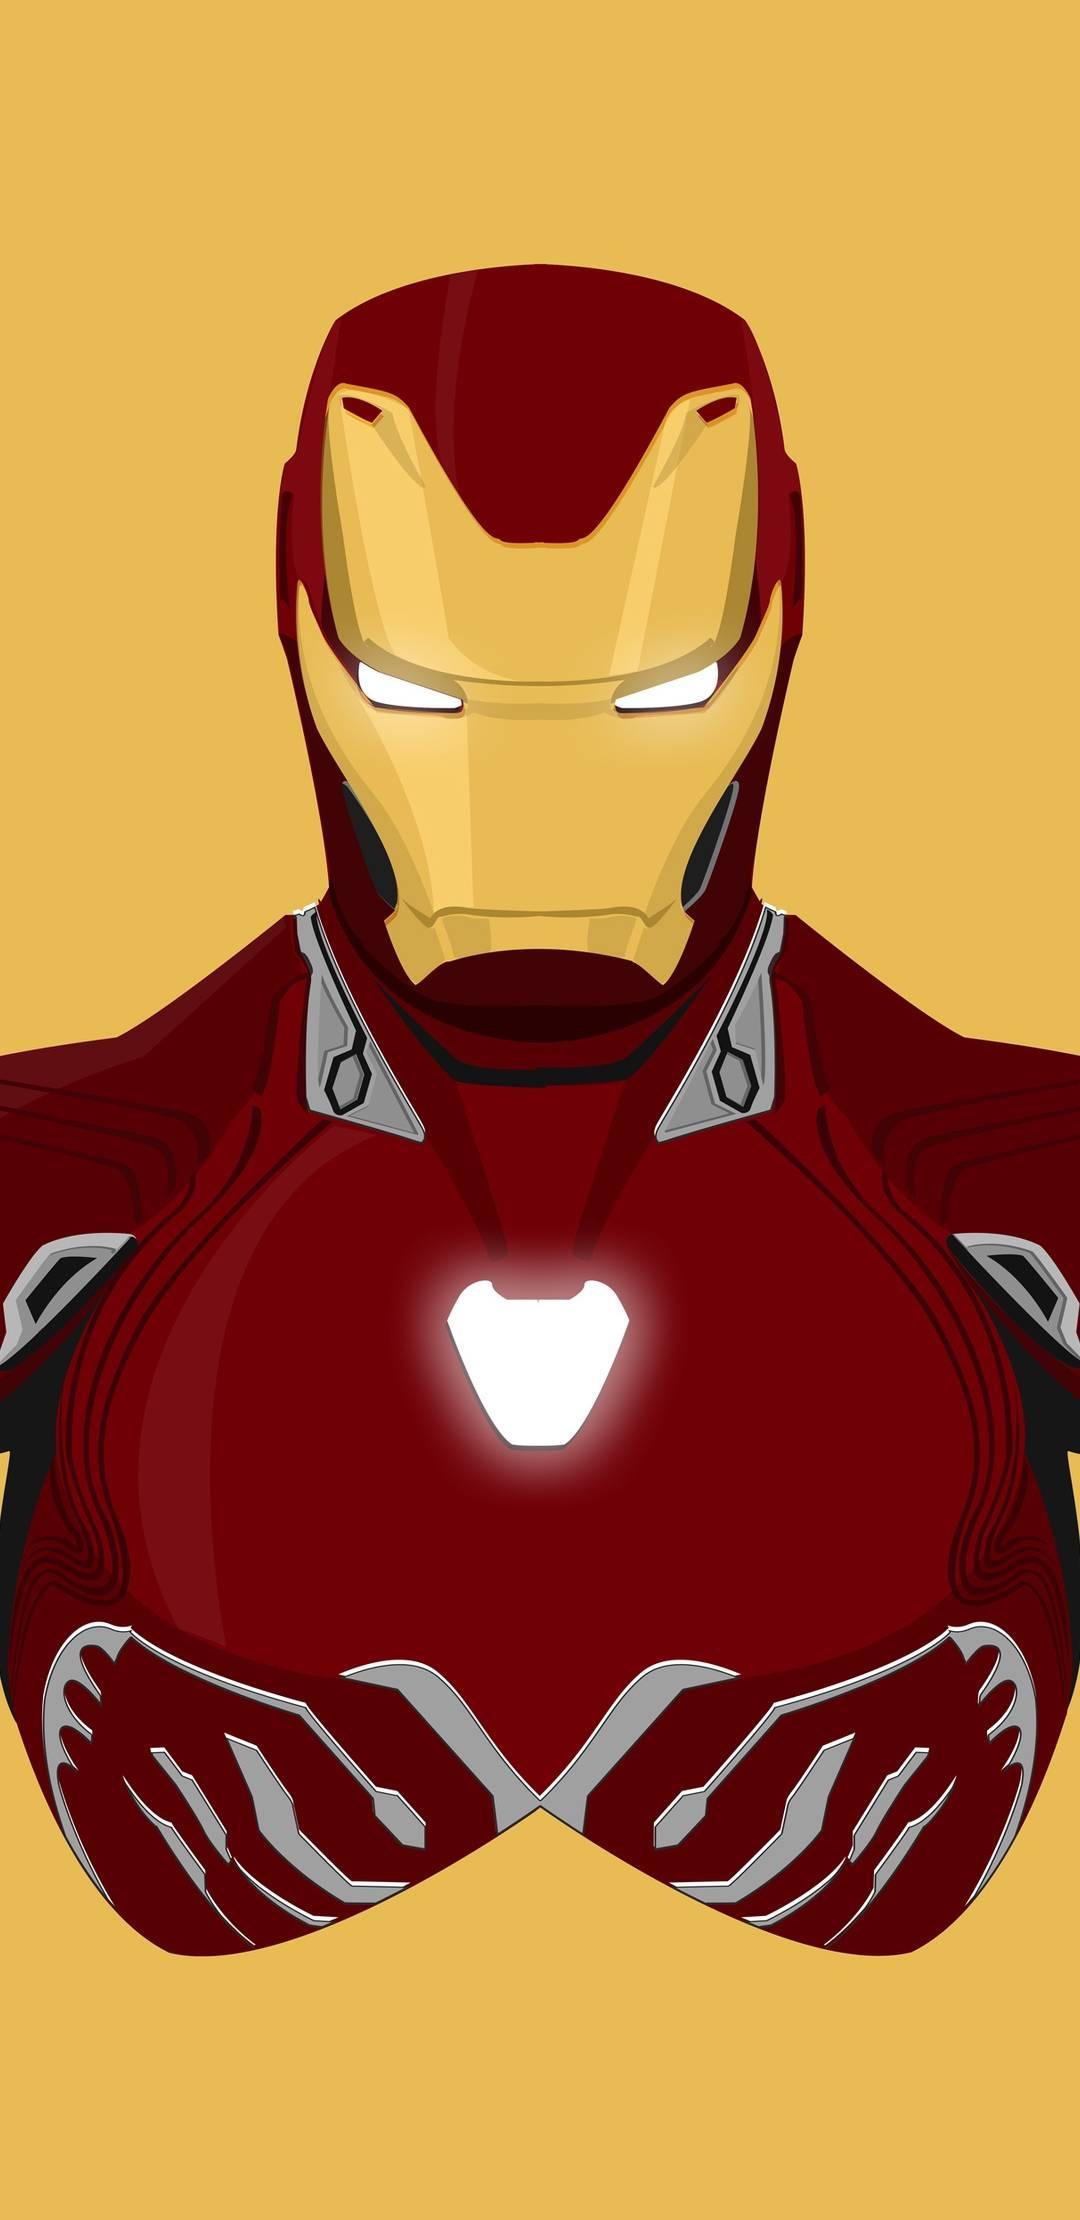 Iron Man Mark 85 Armor Art iPhone Wallpaper